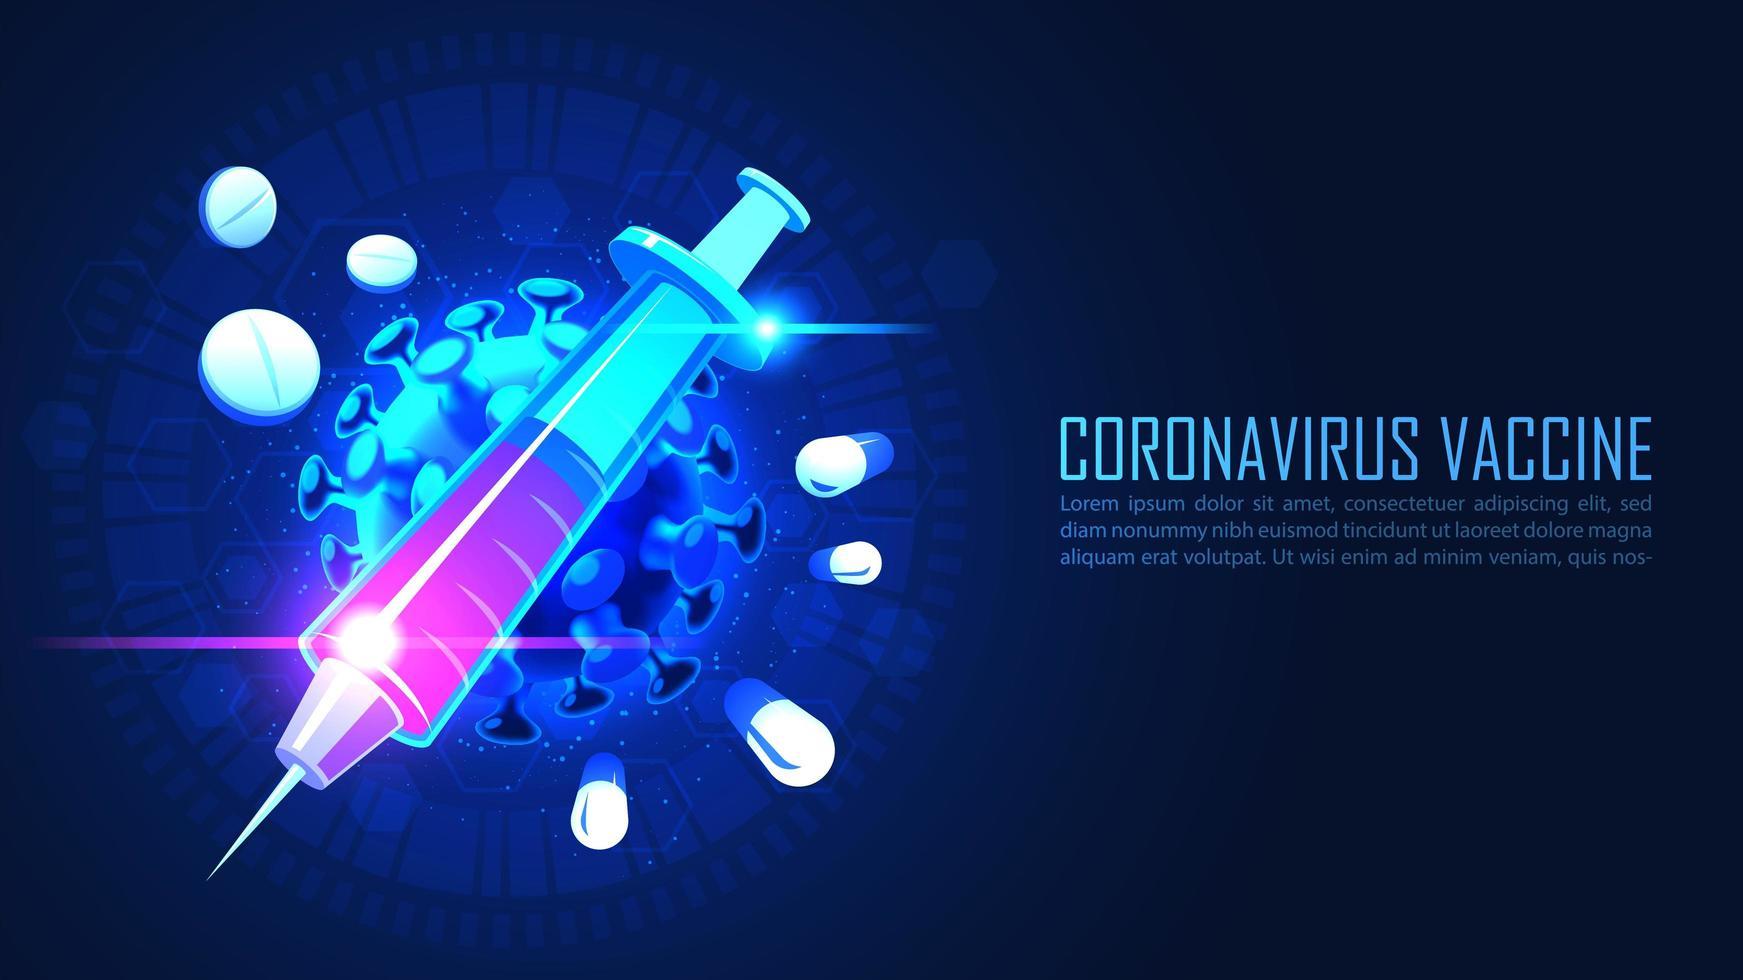 Medicine syringe with virus vaccine serum vector